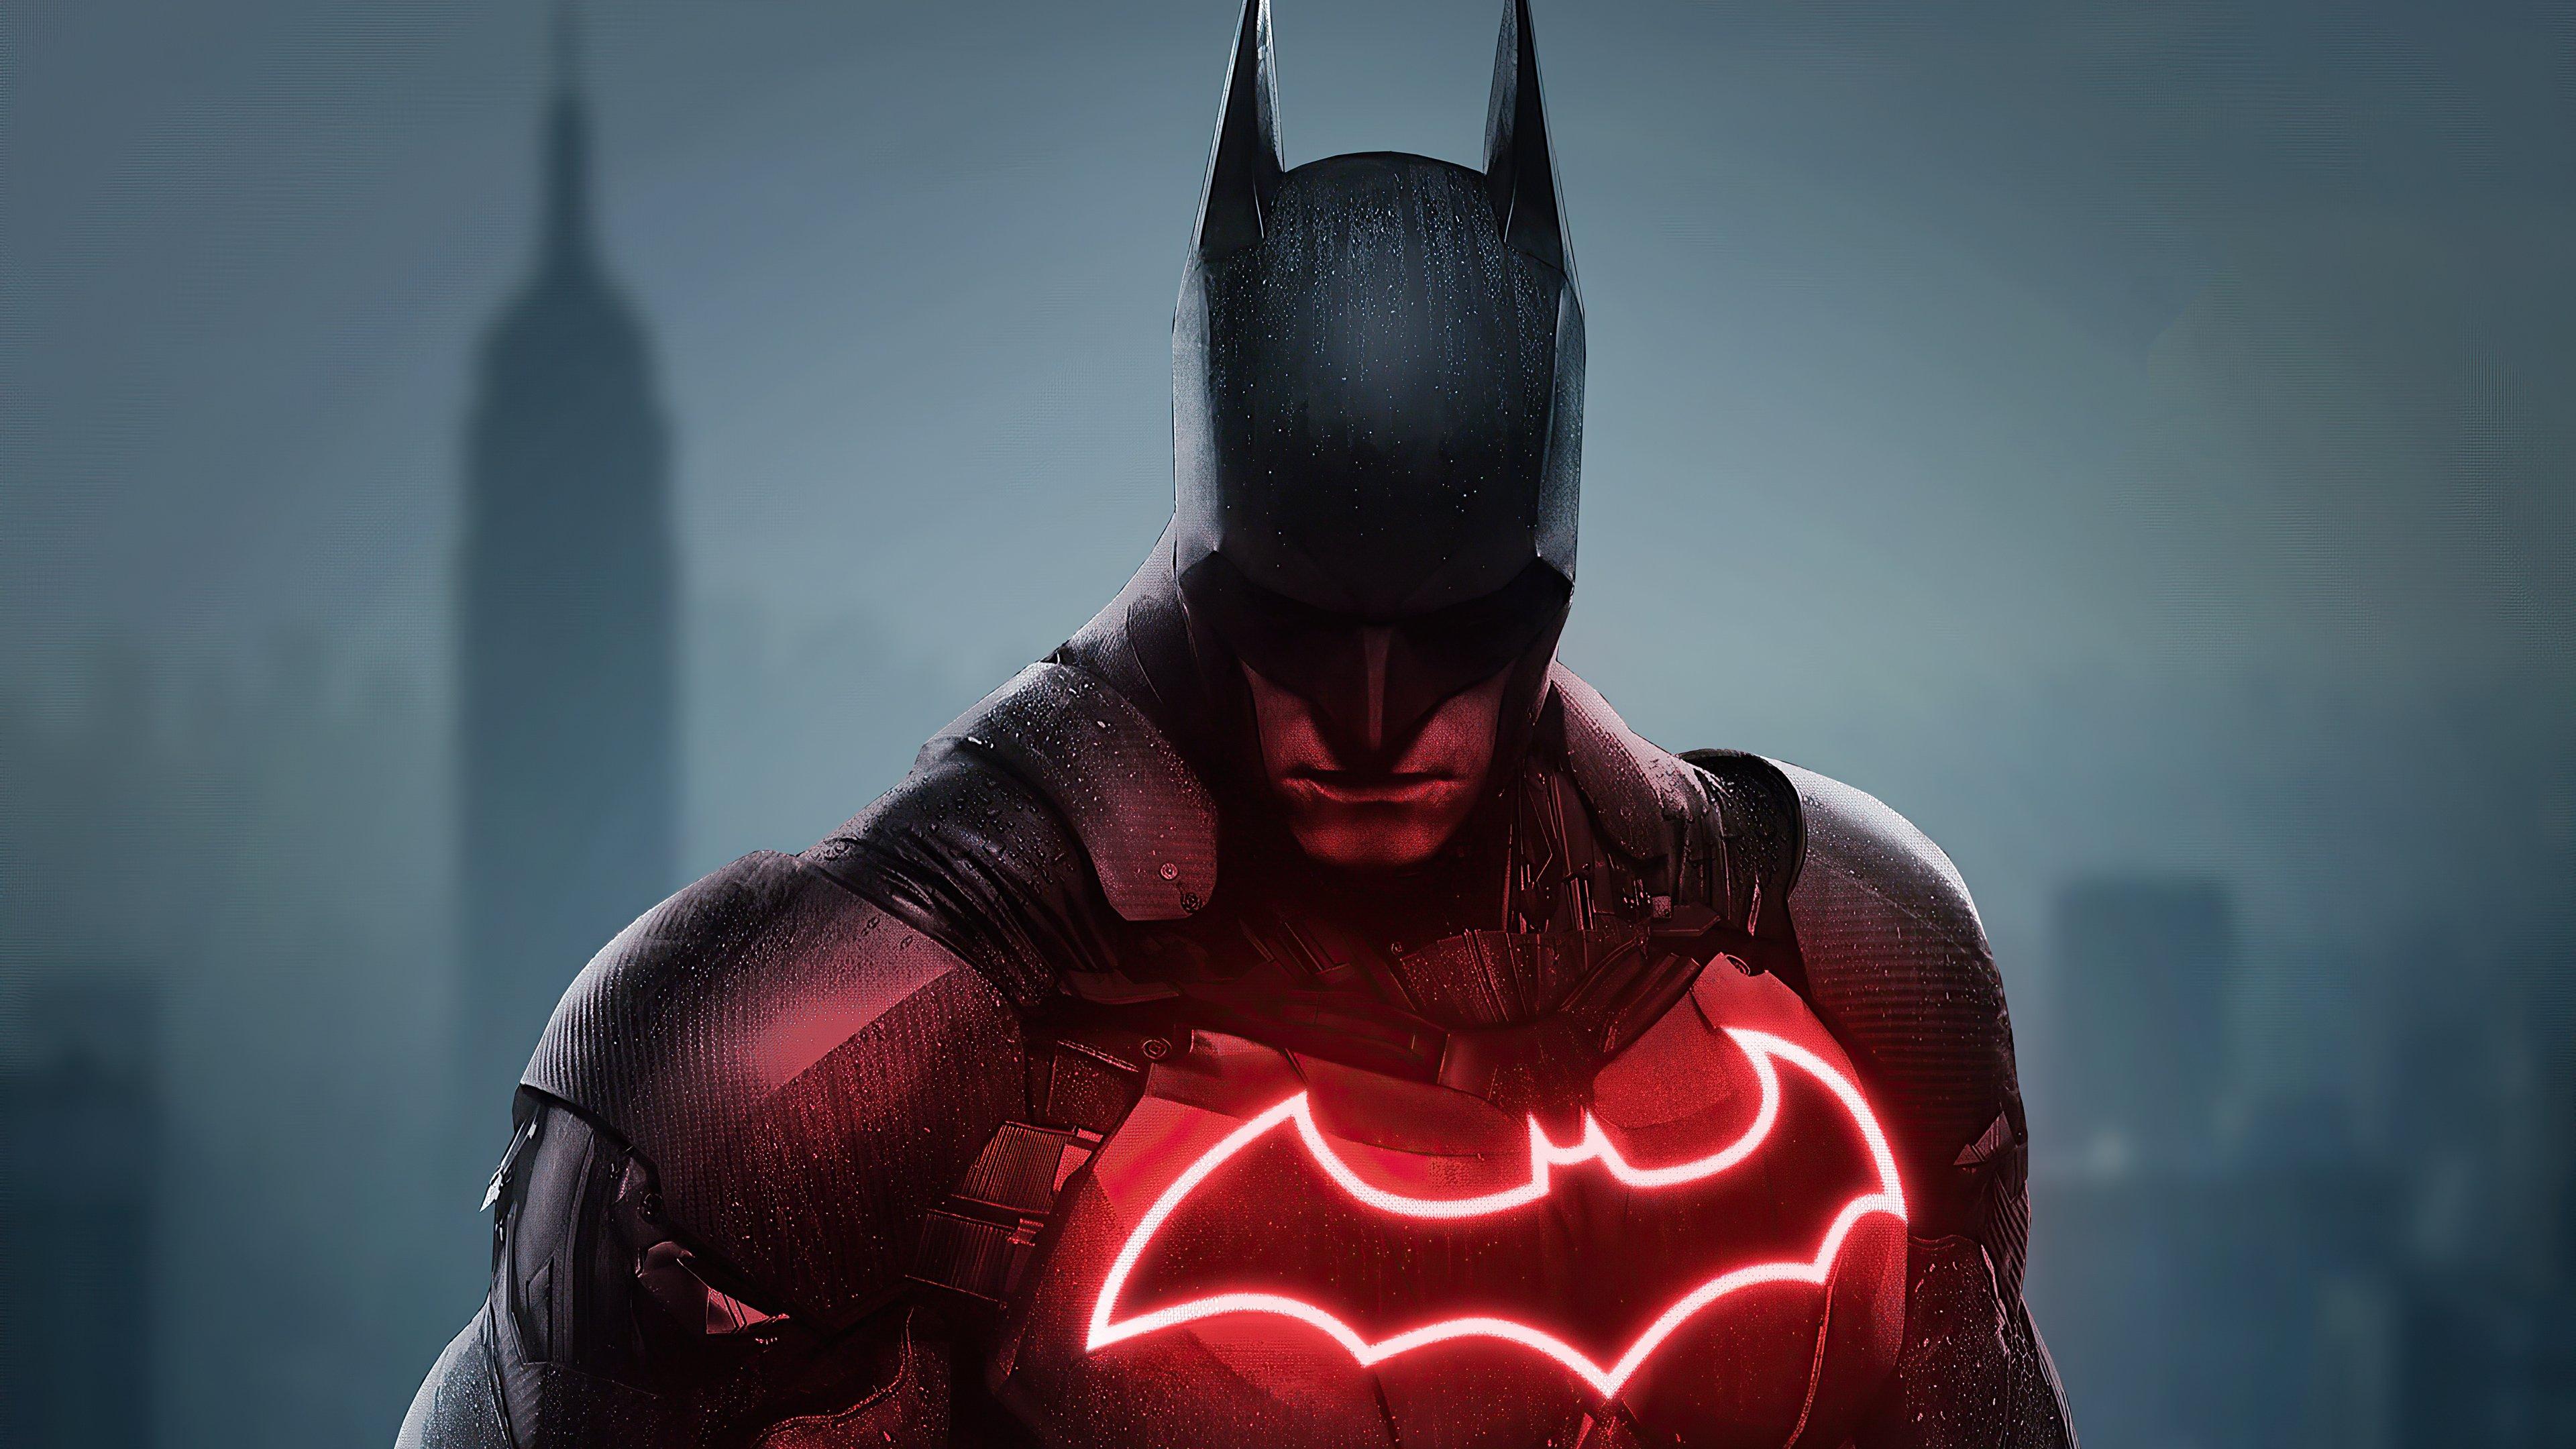 Wallpaper Batman red and black